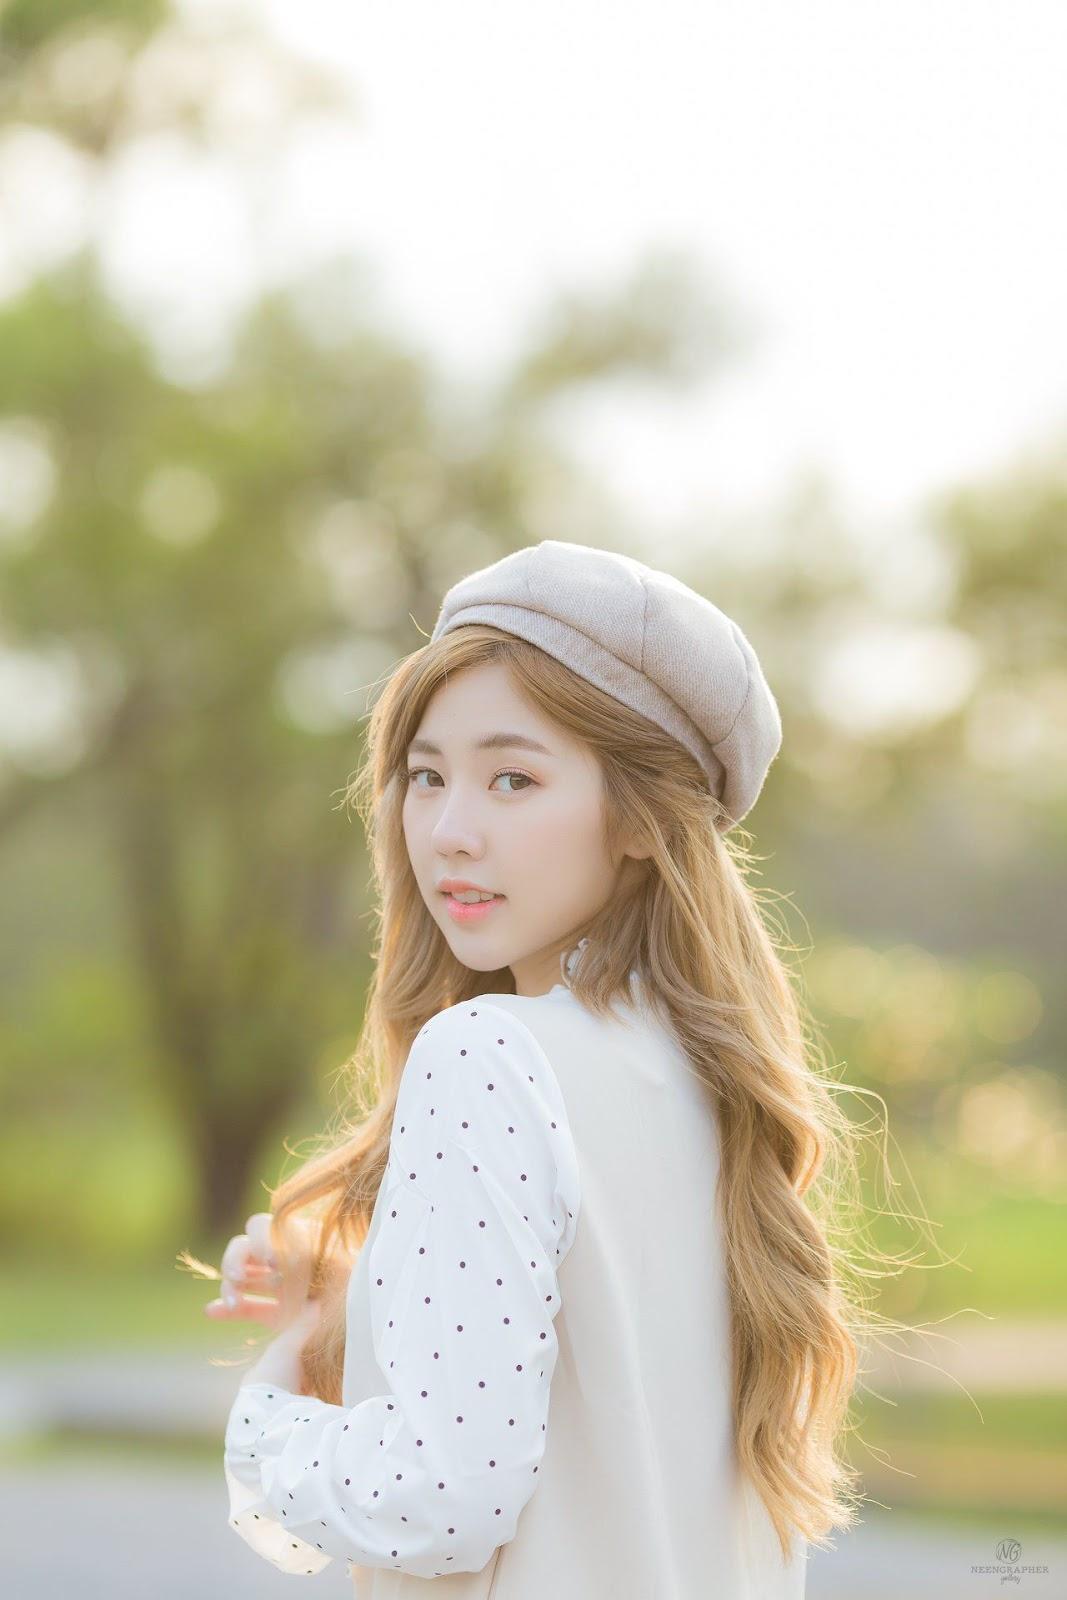 Thailand cute model Nilawan Iamchuasawad - Beautiful girl in the flower field - Photo by จิตรทิวัส จั่นระยับ - Picture 5